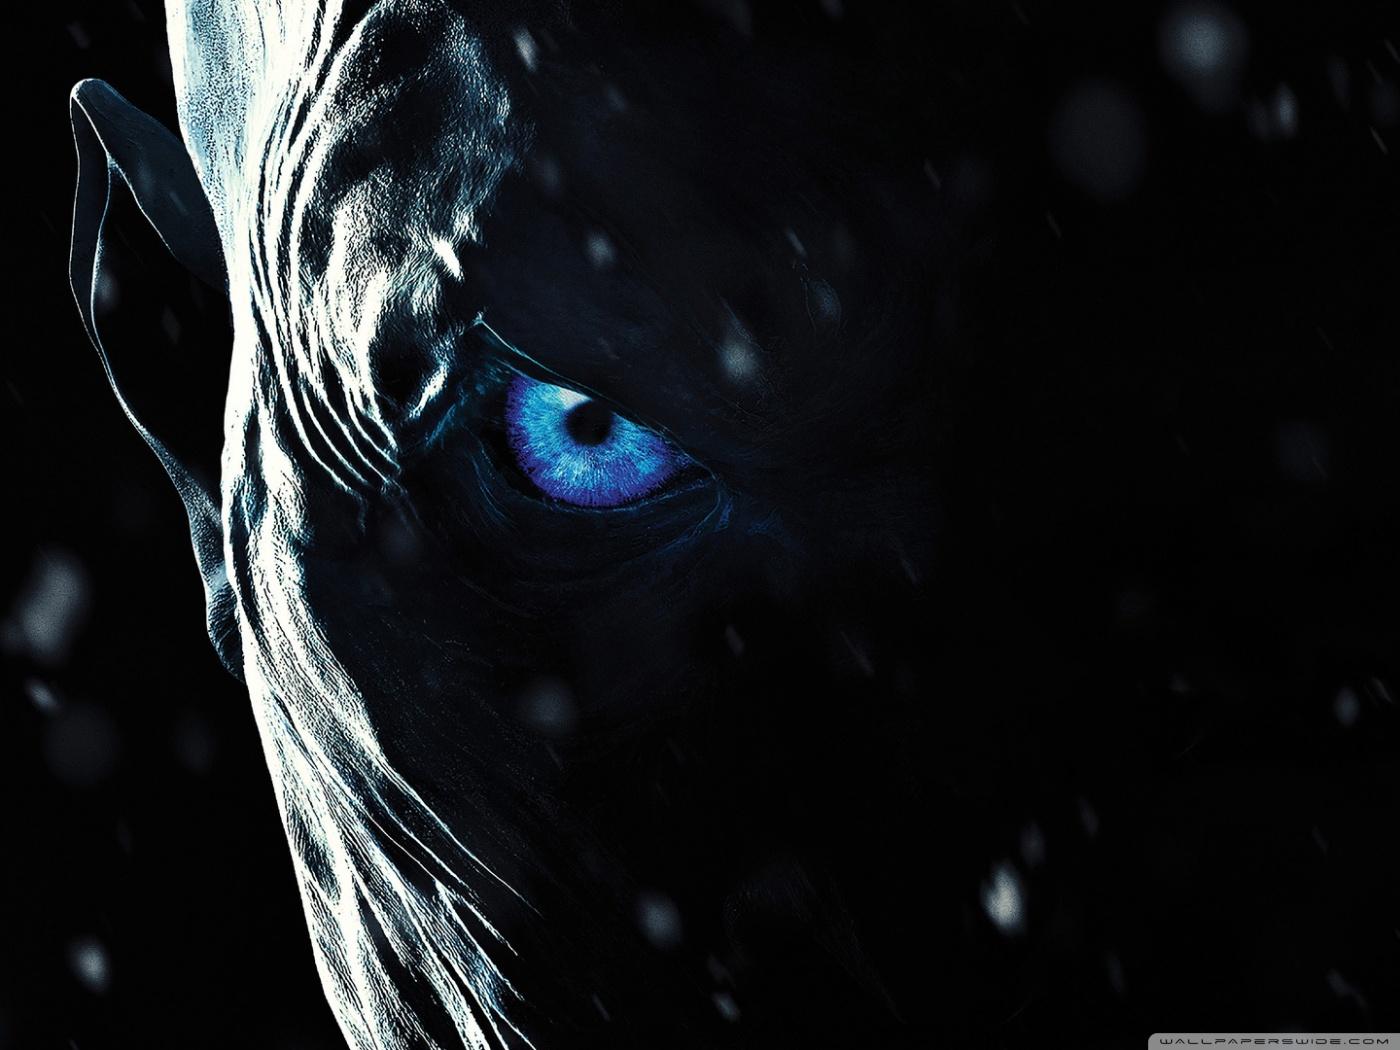 Game Of Thrones Season 7 White Walkers 4K HD Desktop Wallpaper 1400x1050